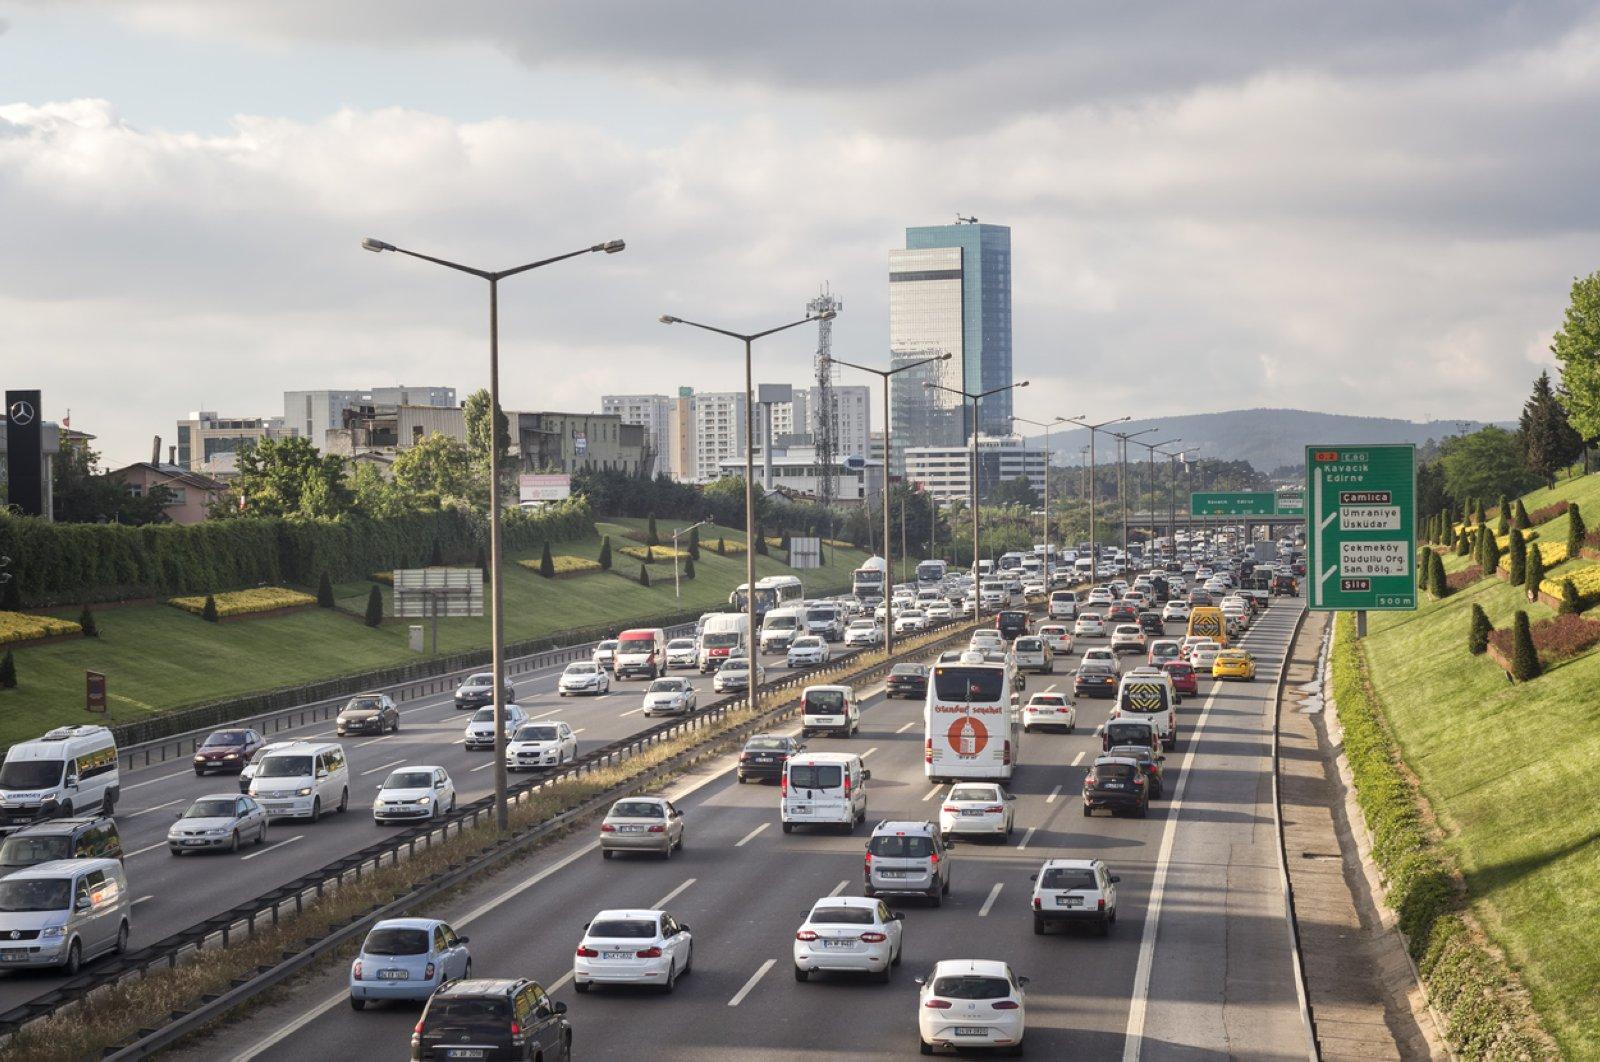 Traffic flows on a highway in Tepeüstü, a neighborhood of Istanbul's Ümraniye district, Turkey, May 15, 2017. (iStock Photo)